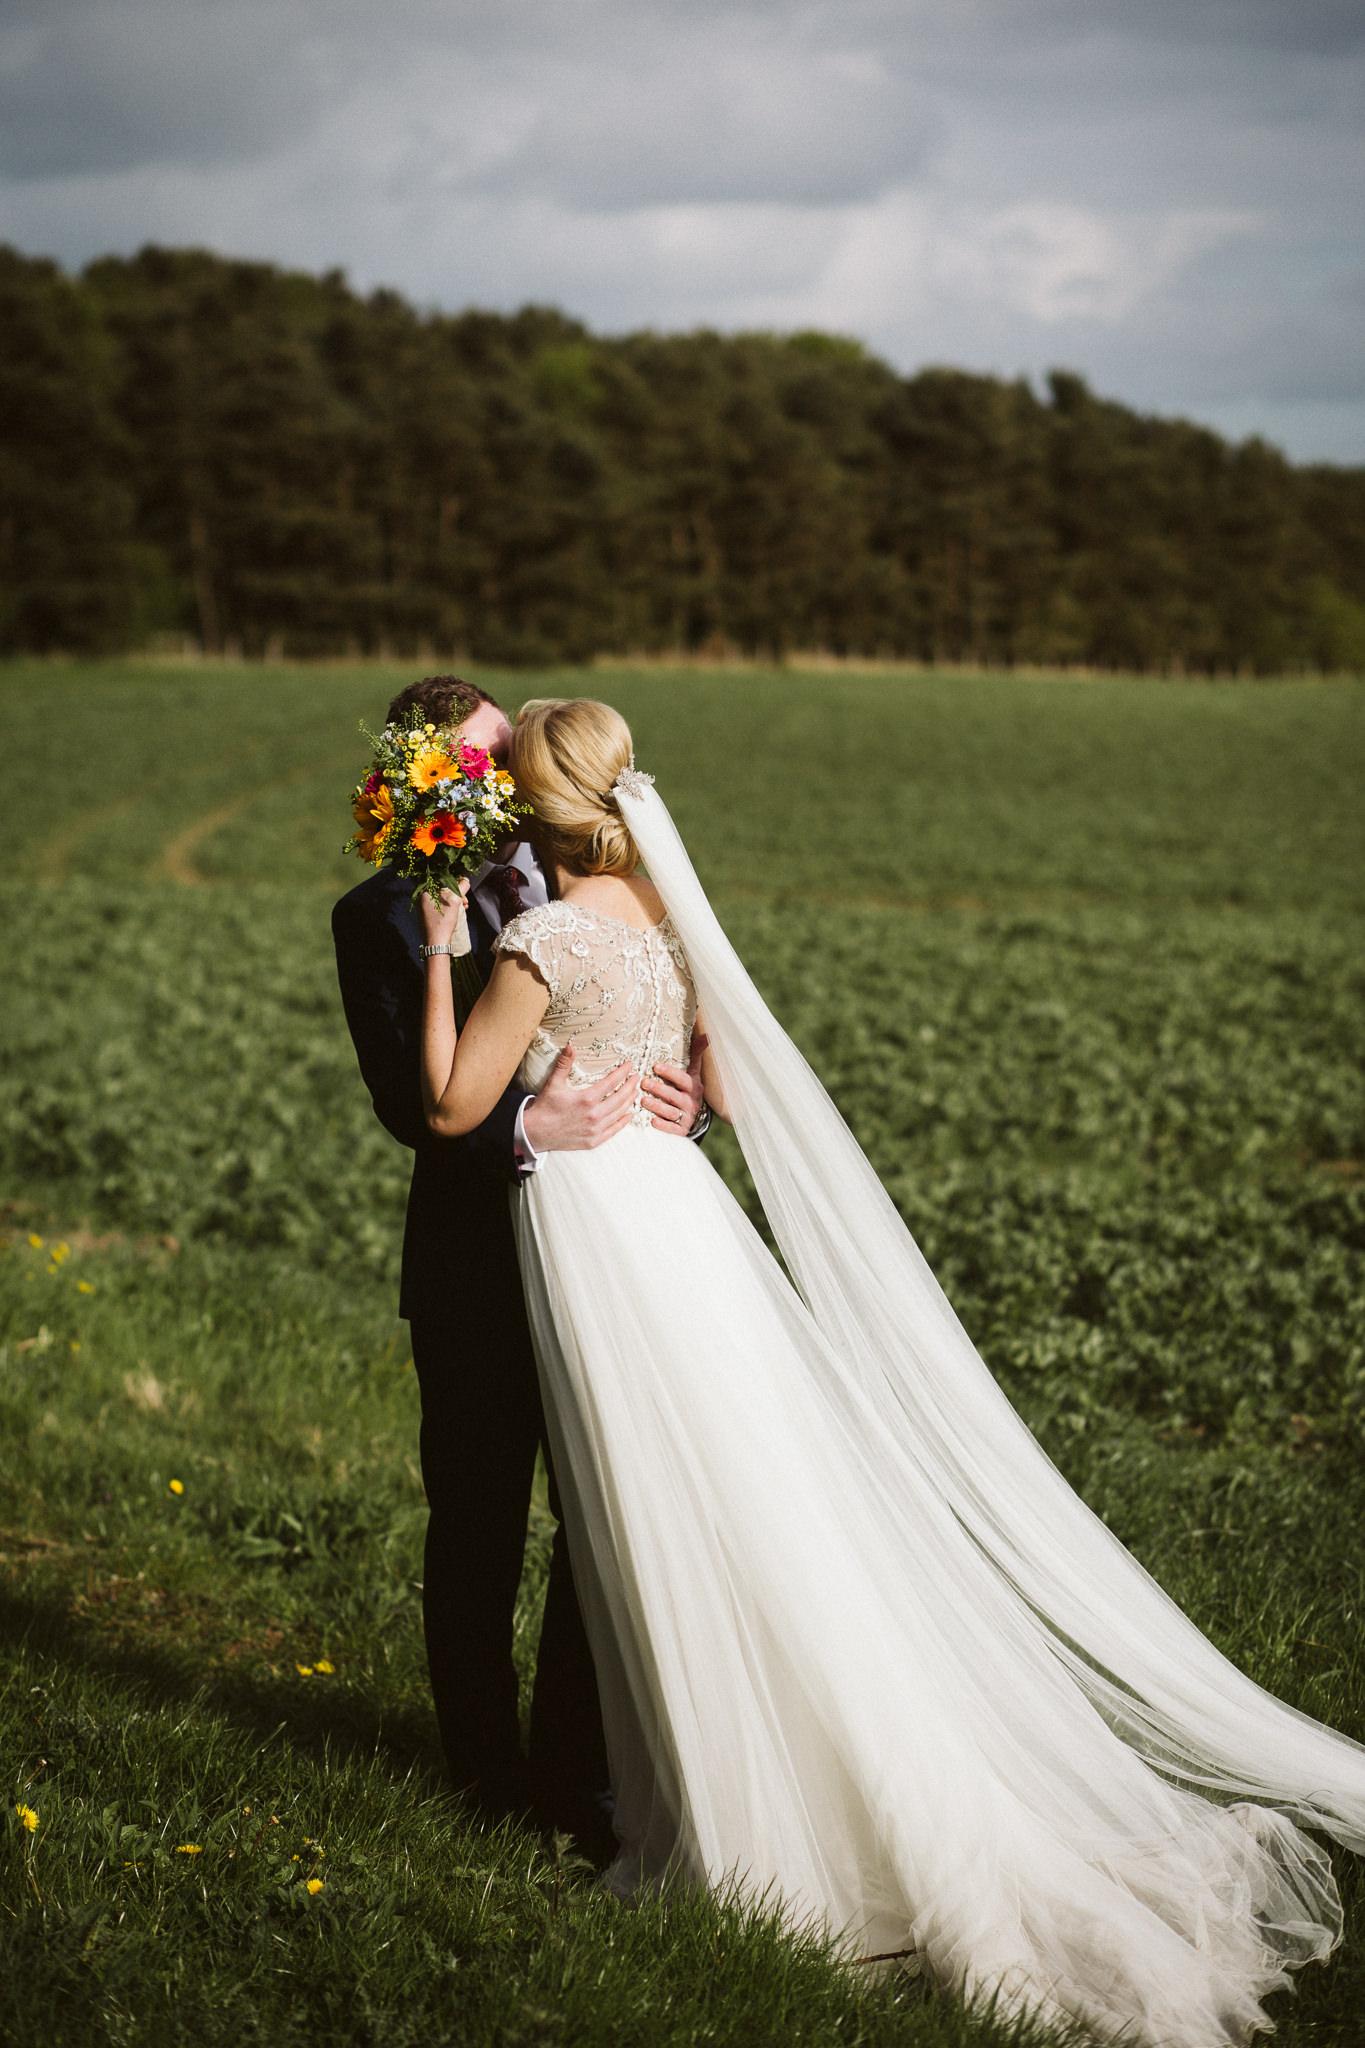 northside-farm-wedding-northumberland-margarita-hope (84).jpg